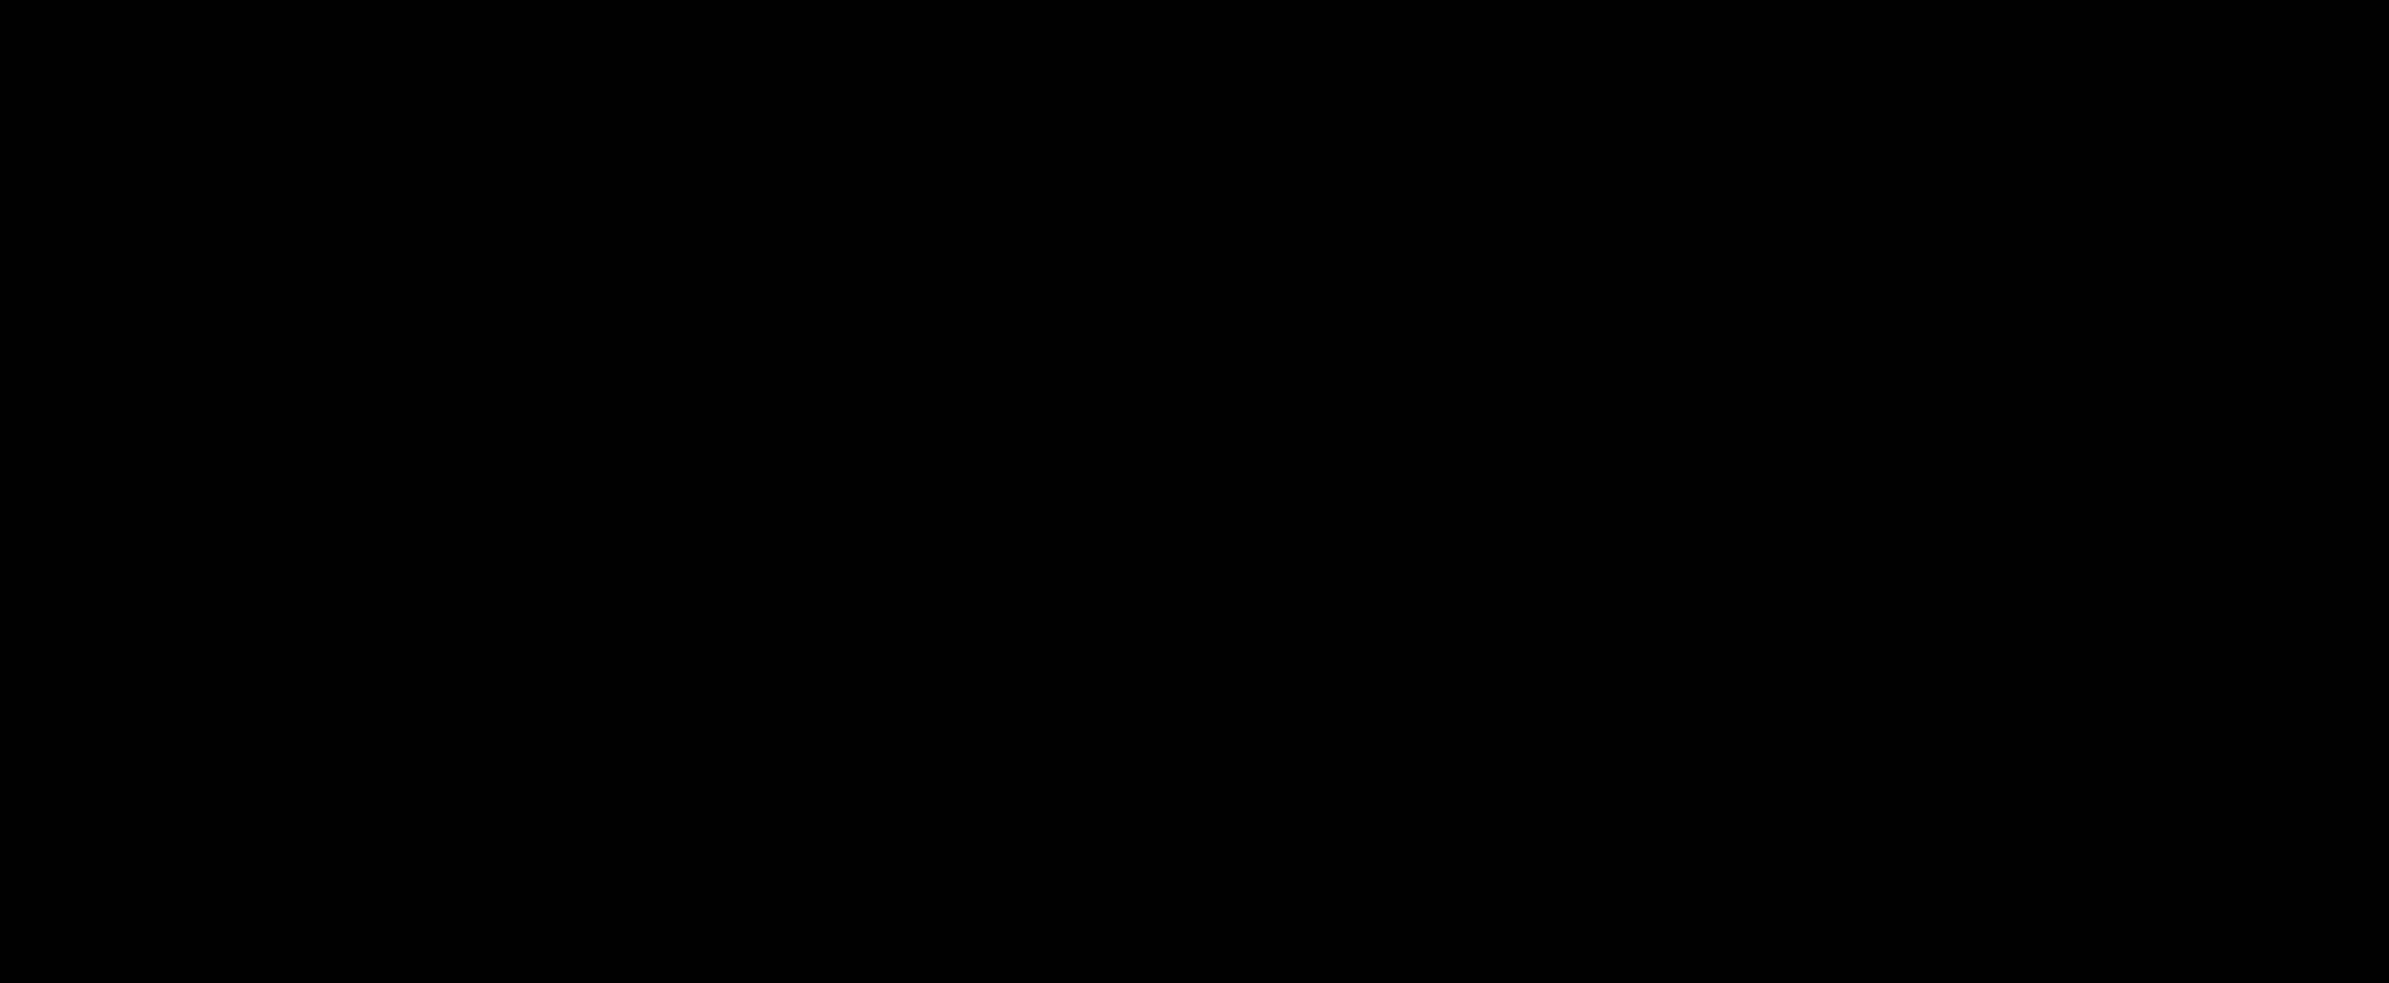 selectvisa-pte2